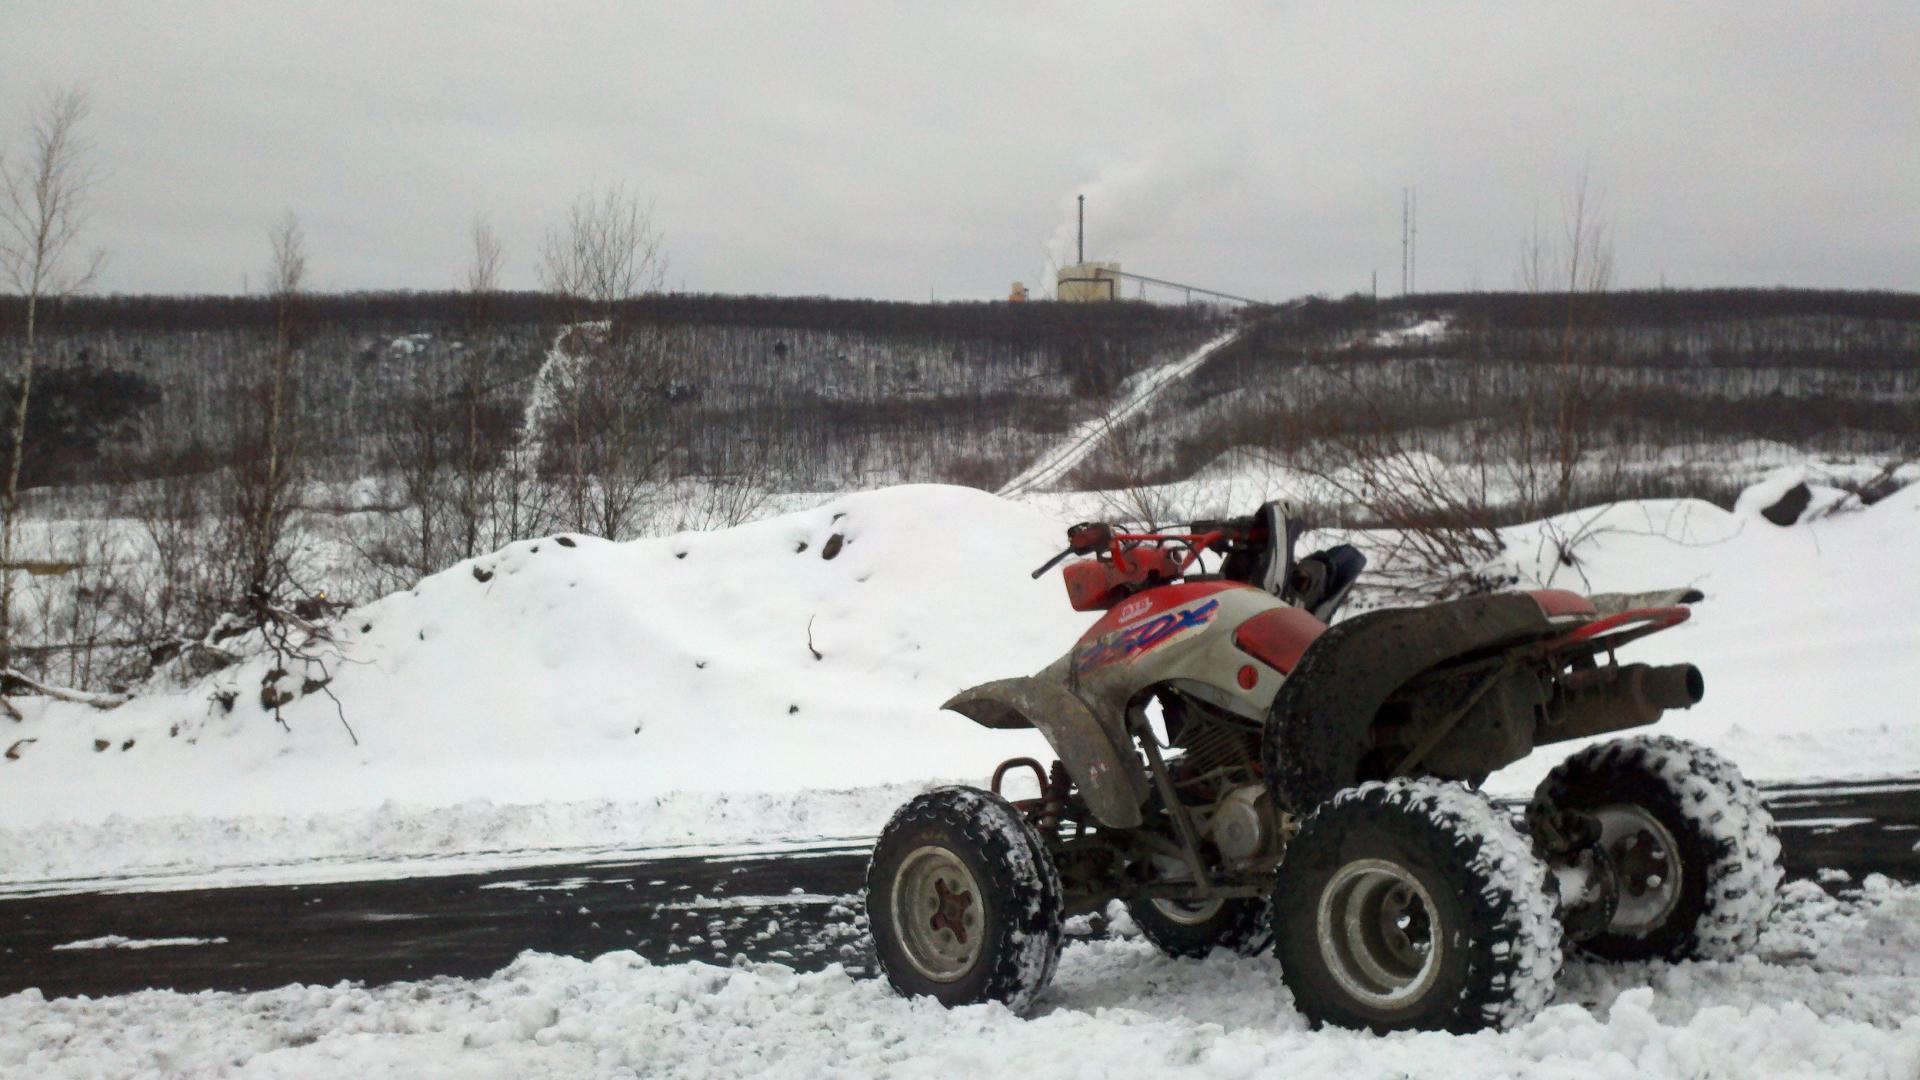 Landscapes snow honda quad bike four wheeler wallpaper 38932 1920x1080